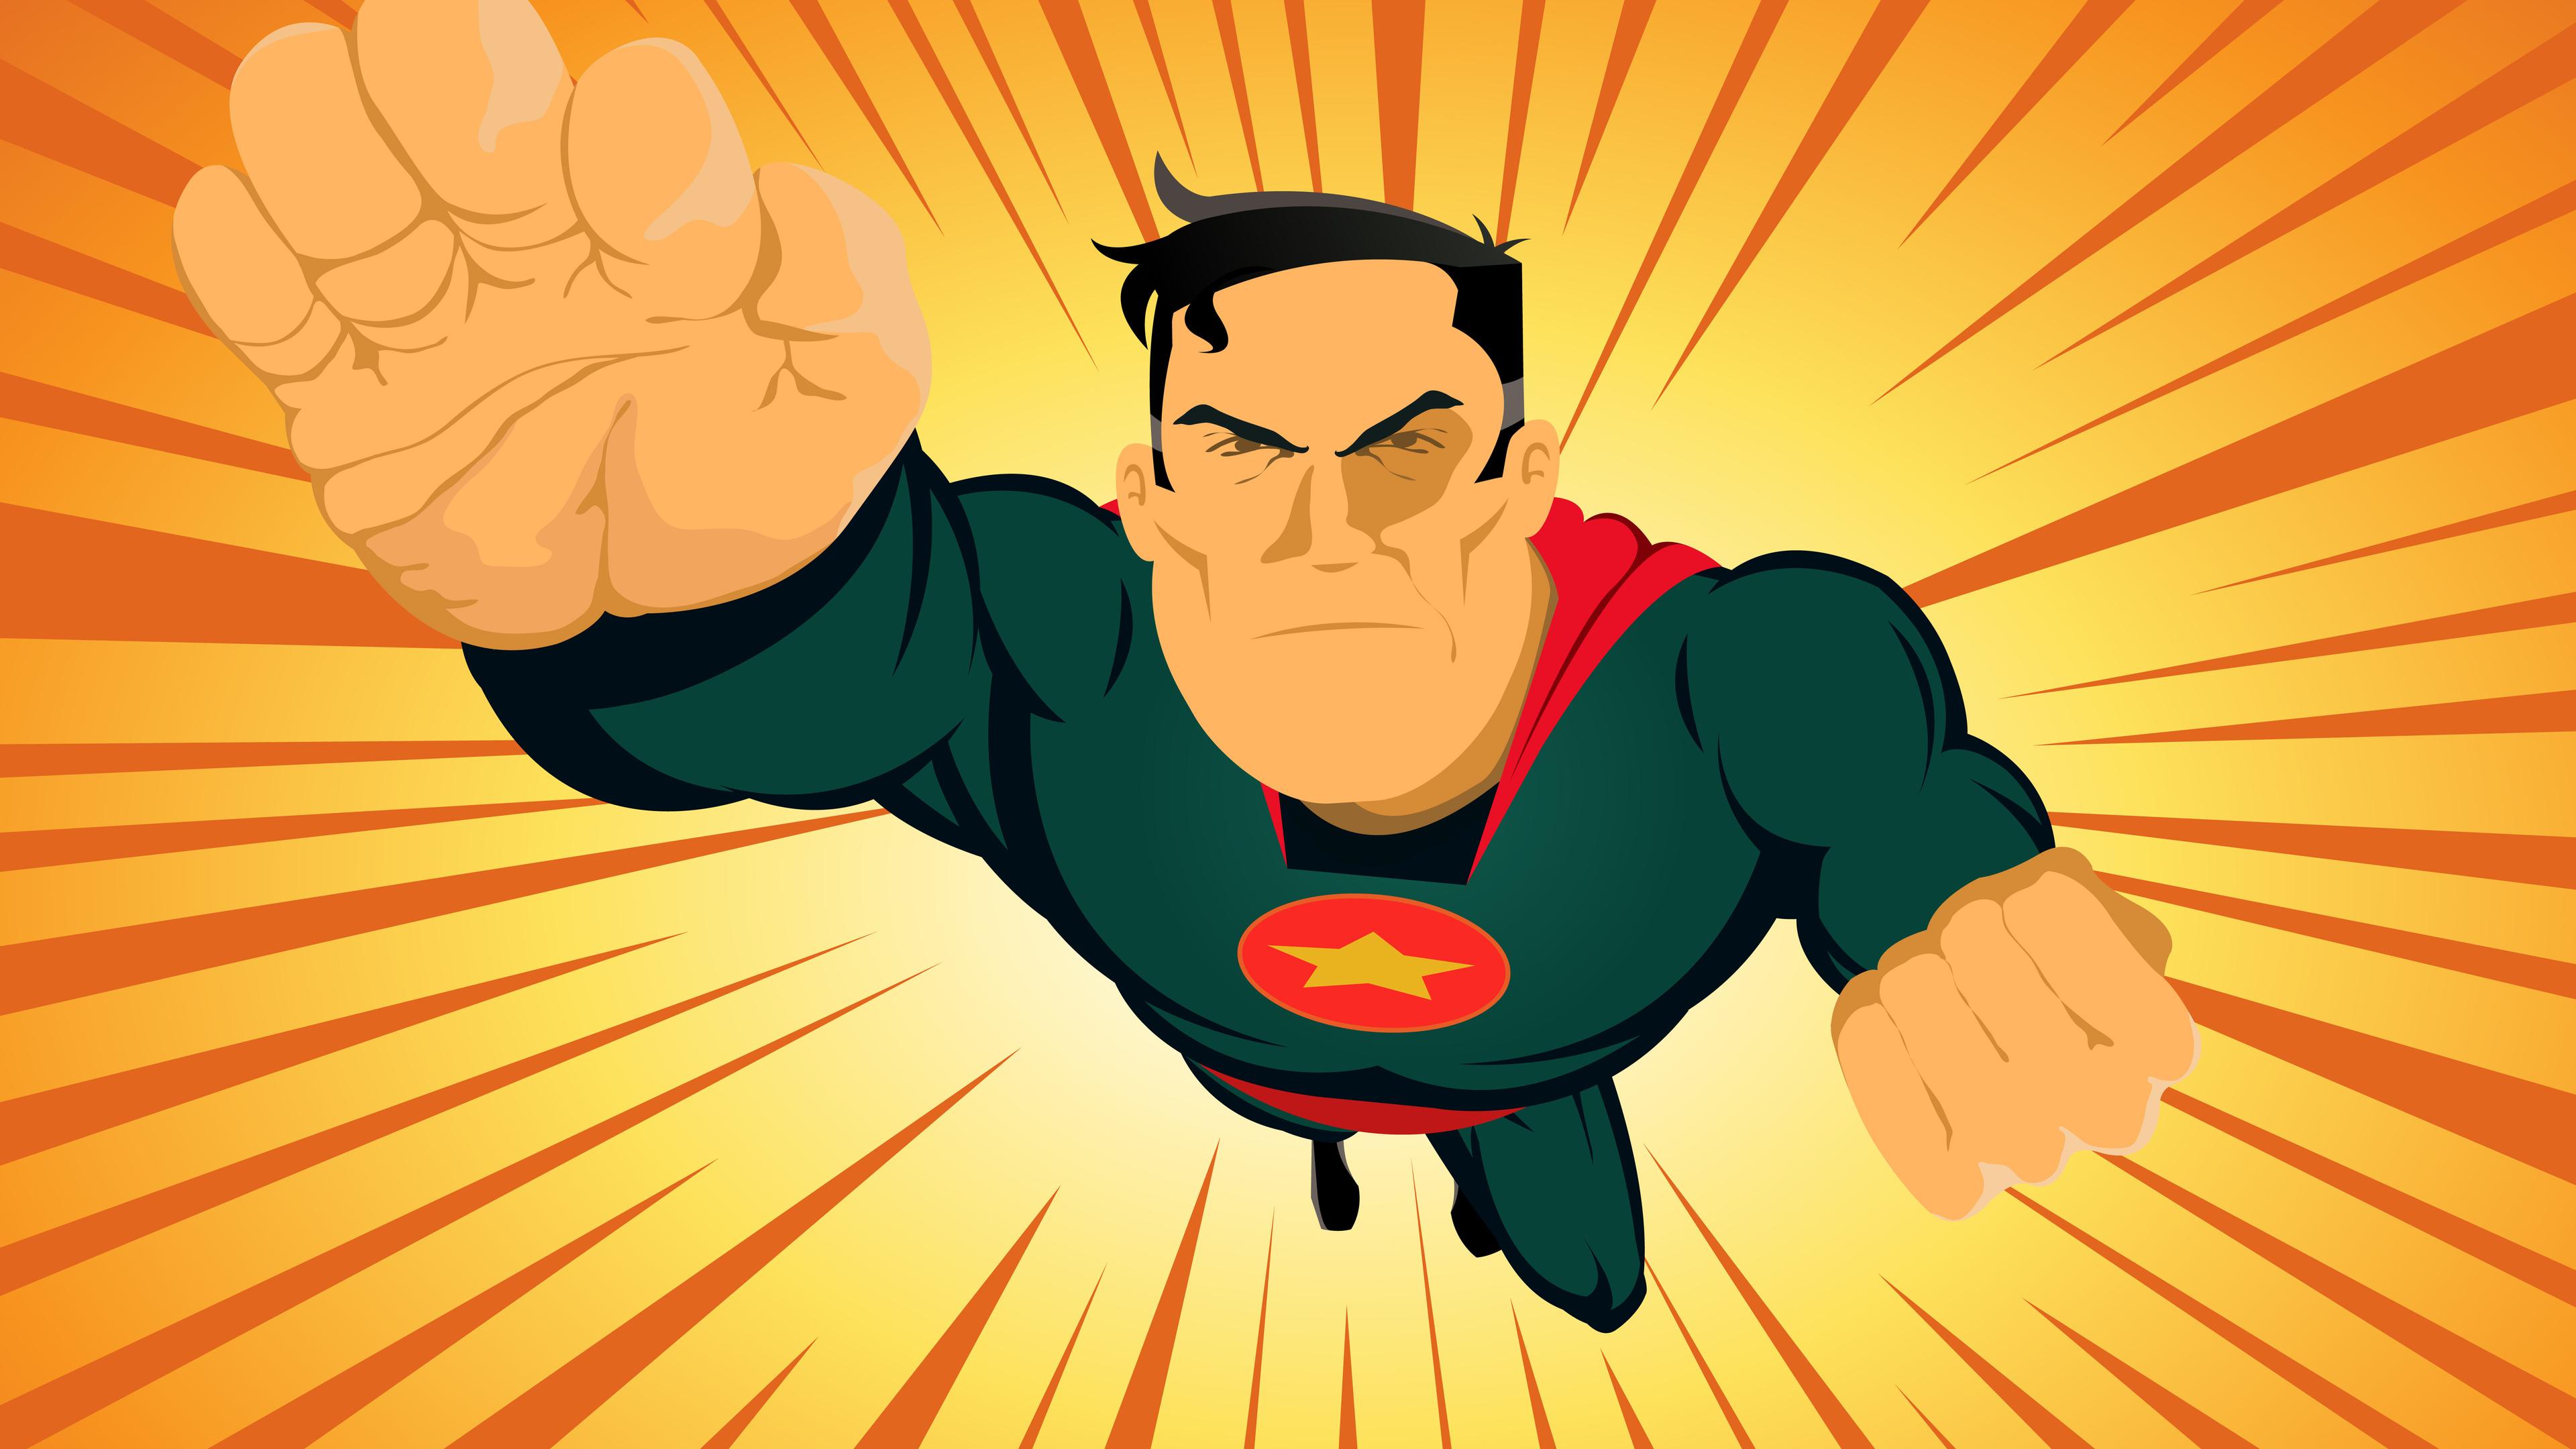 comic superhero 4k 1544286642 - Comic Superhero 4k - superheroes wallpapers, hd-wallpapers, digital art wallpapers, artwork wallpapers, 4k-wallpapers